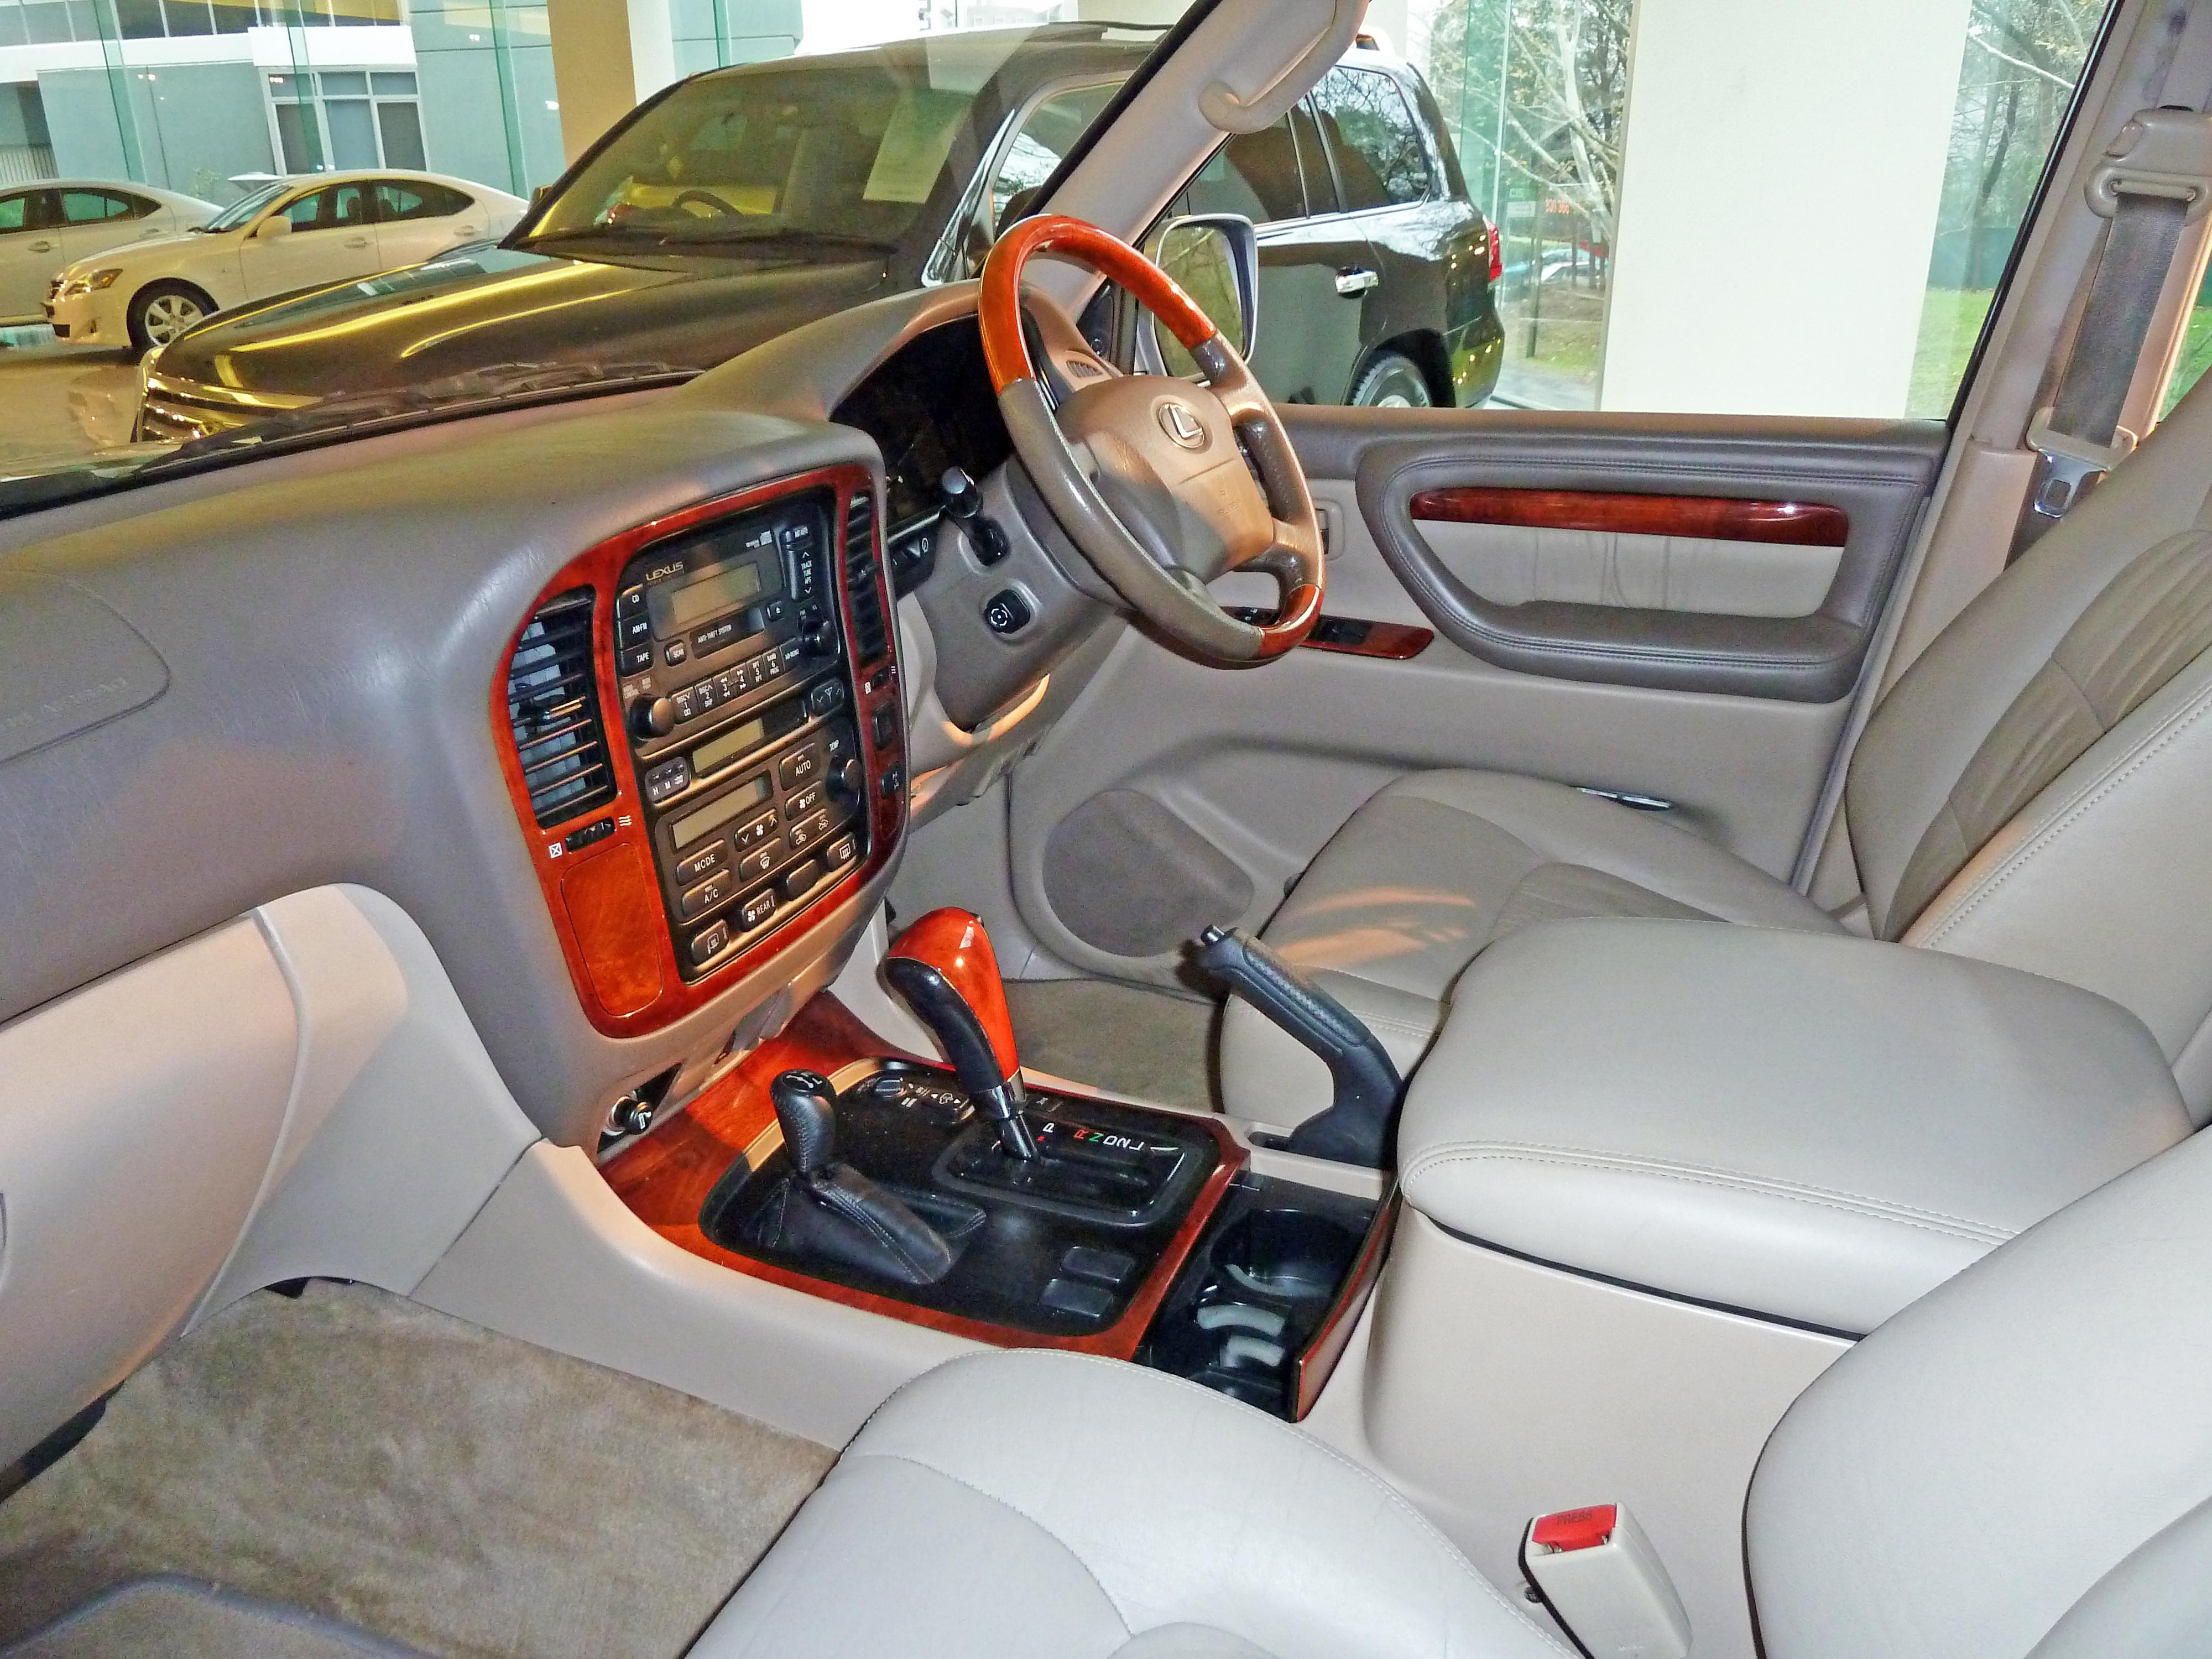 File:2000 Lexus LX 470 (UZJ100R) wagon (2010-07-13) jpg - Wikimedia